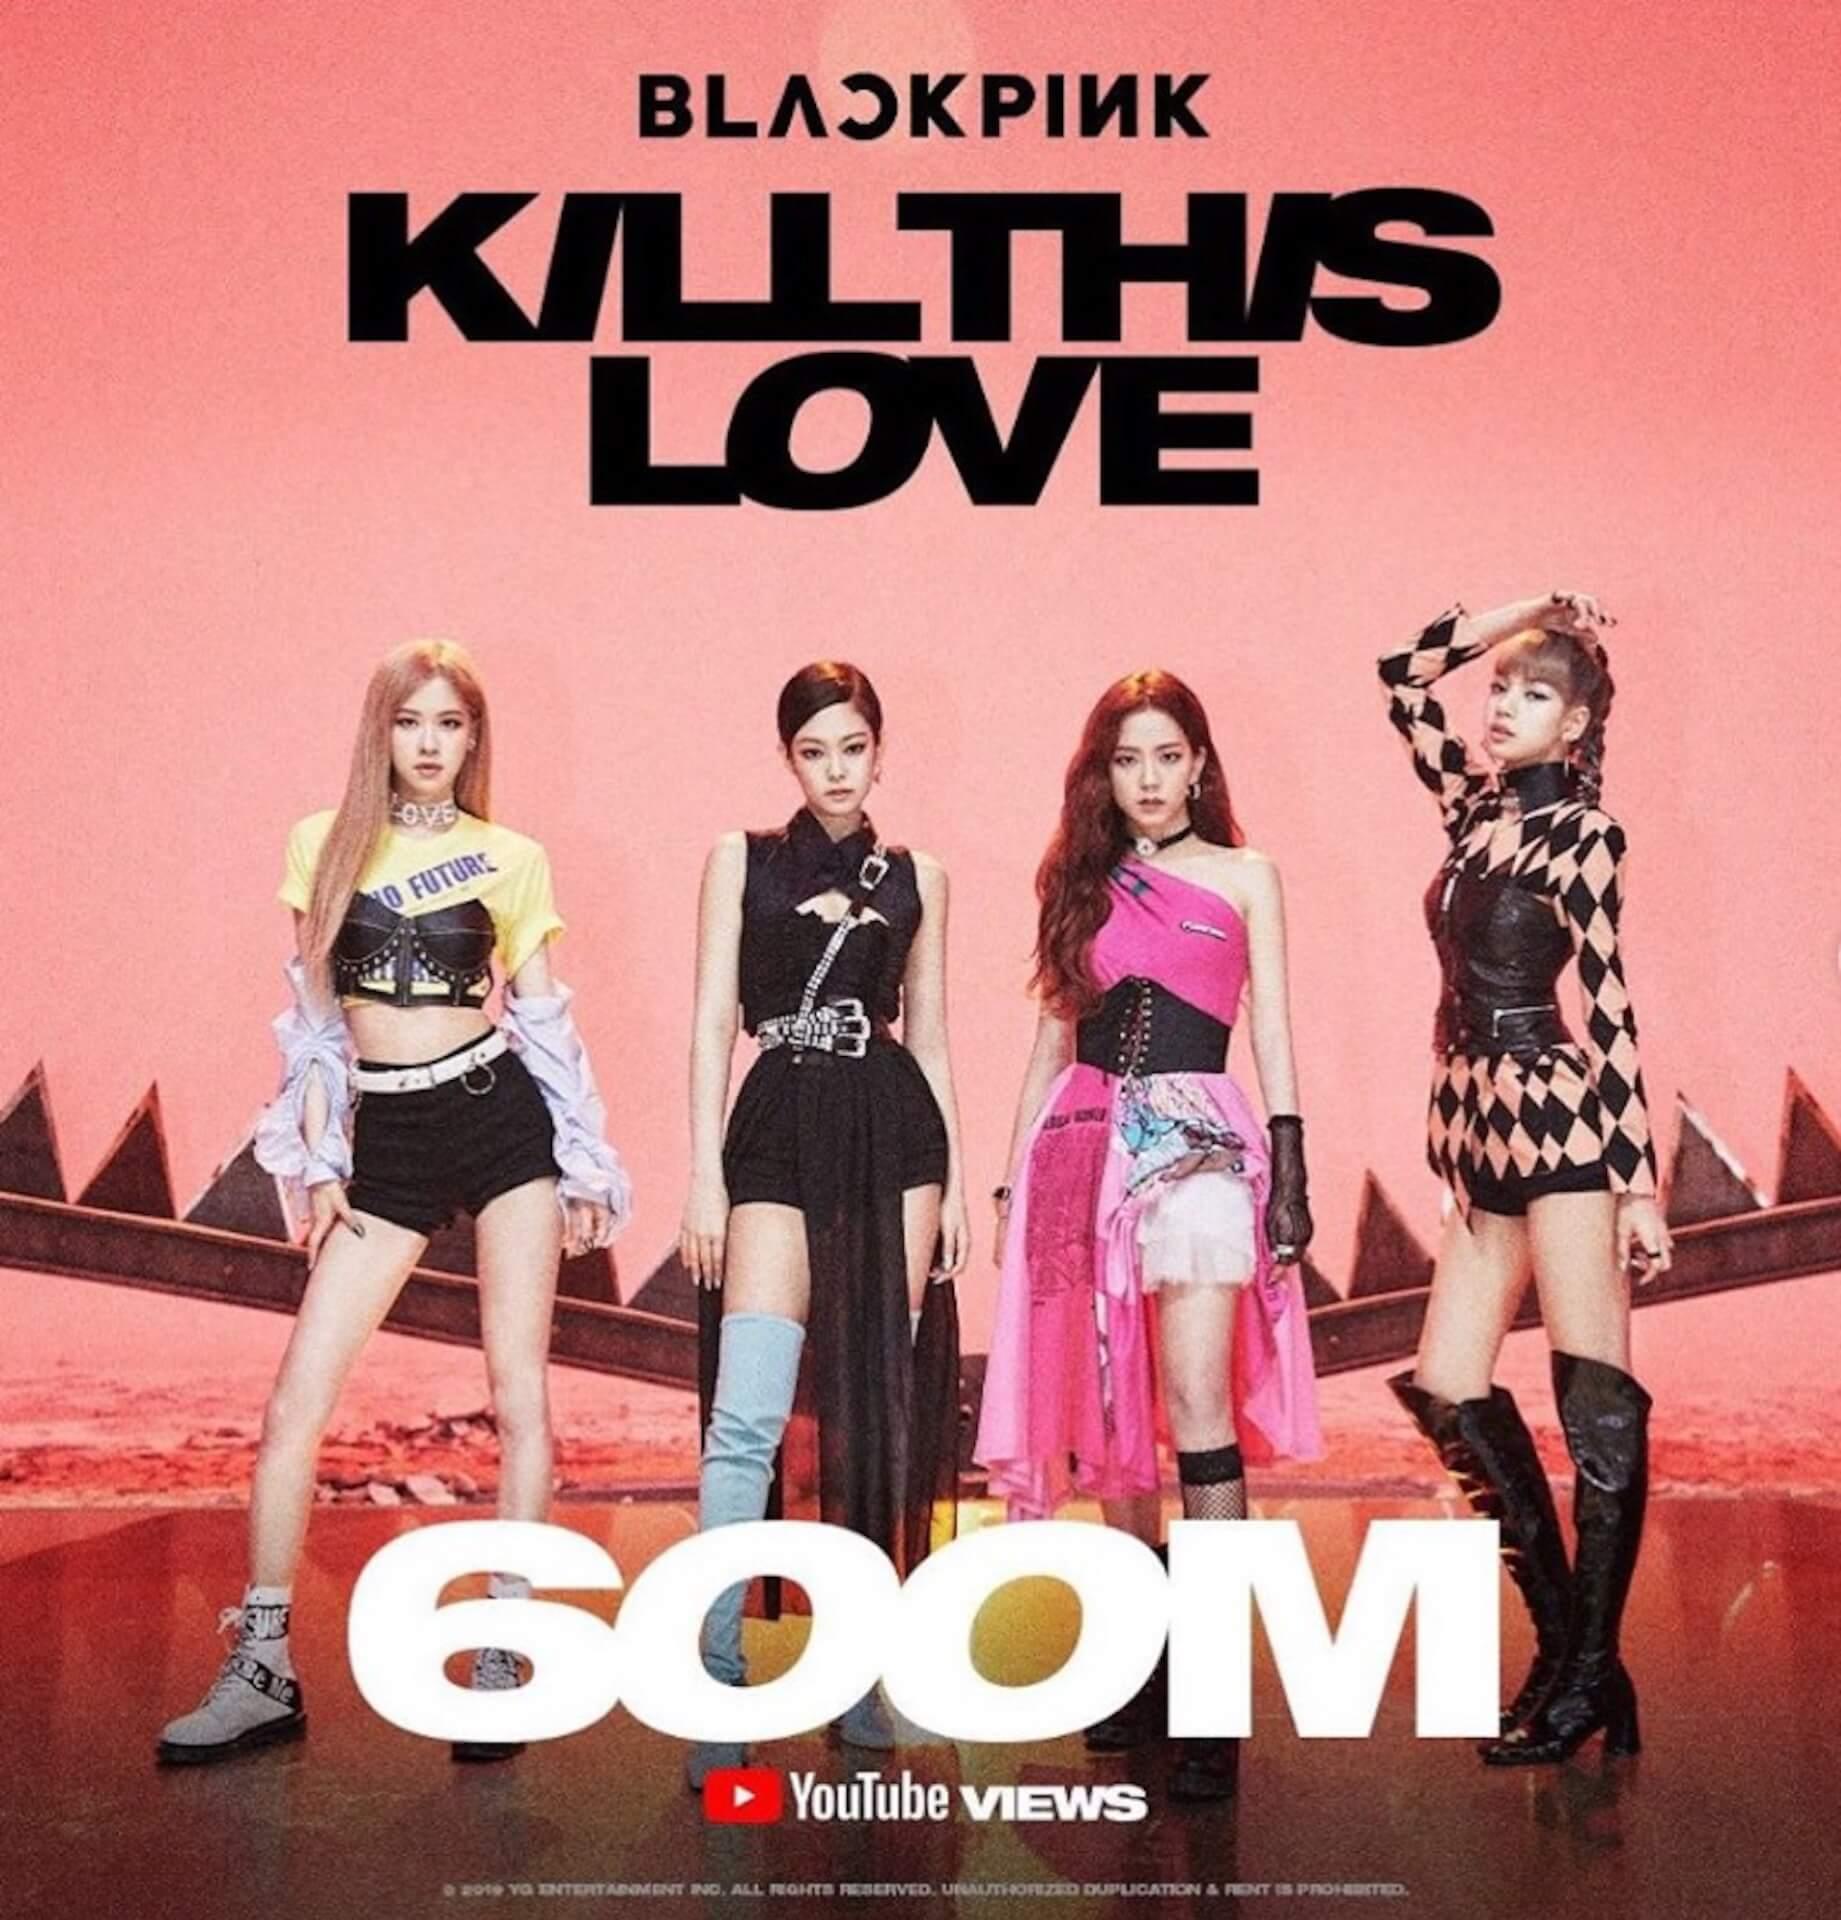 BLACKPINK「Kill This Love」MV6億再生を記録!公開から177日、グループ史上最速 music190930_blackpink_8